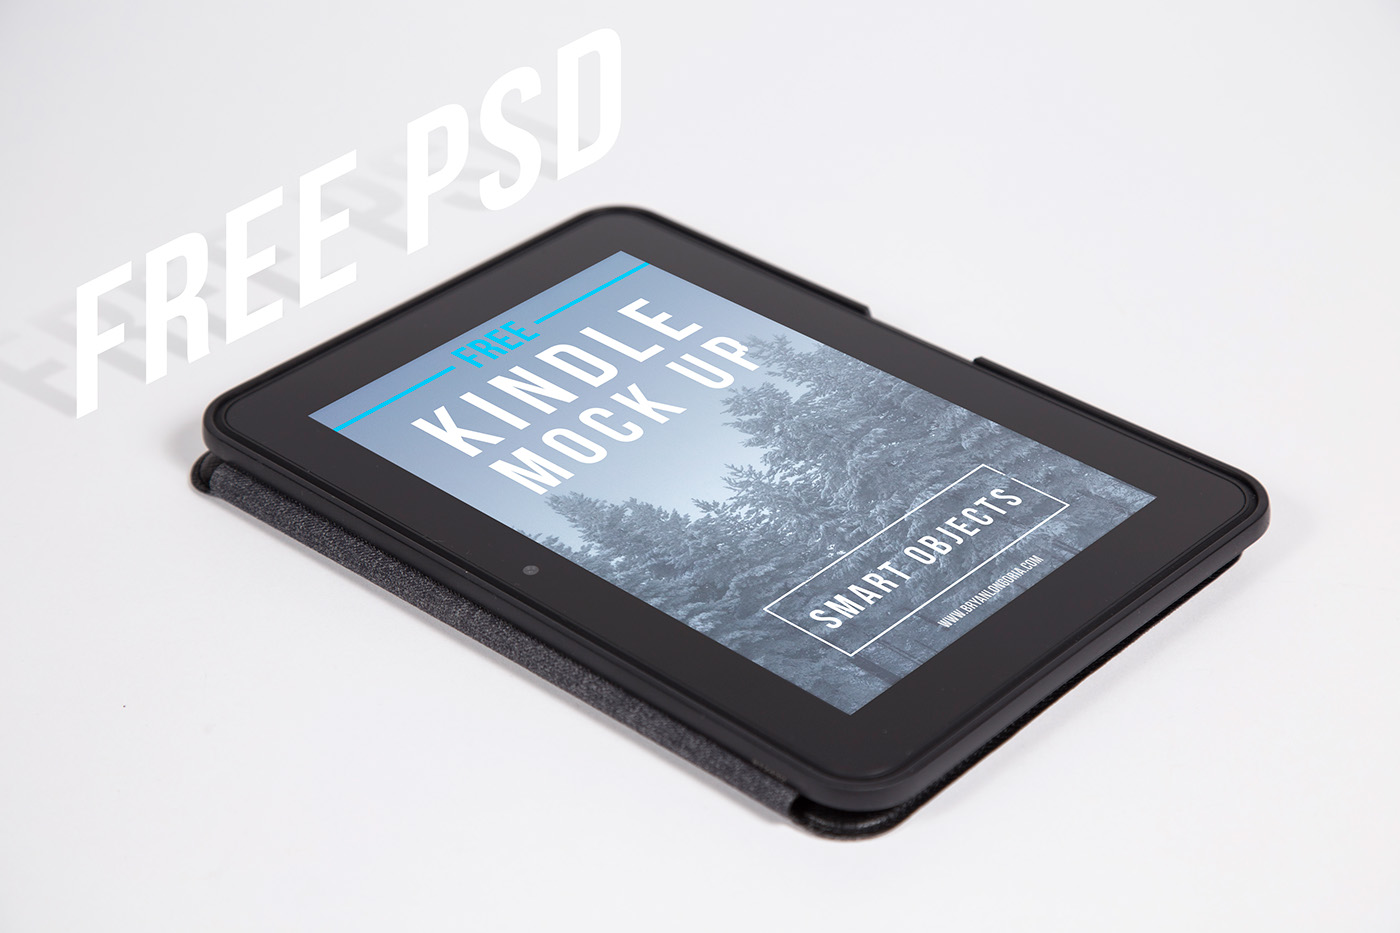 kindle fire e-book mockup free mockup  free mockup psd book cover mockup Kindle Fire HD kindle mockup Free Tablet Mockup